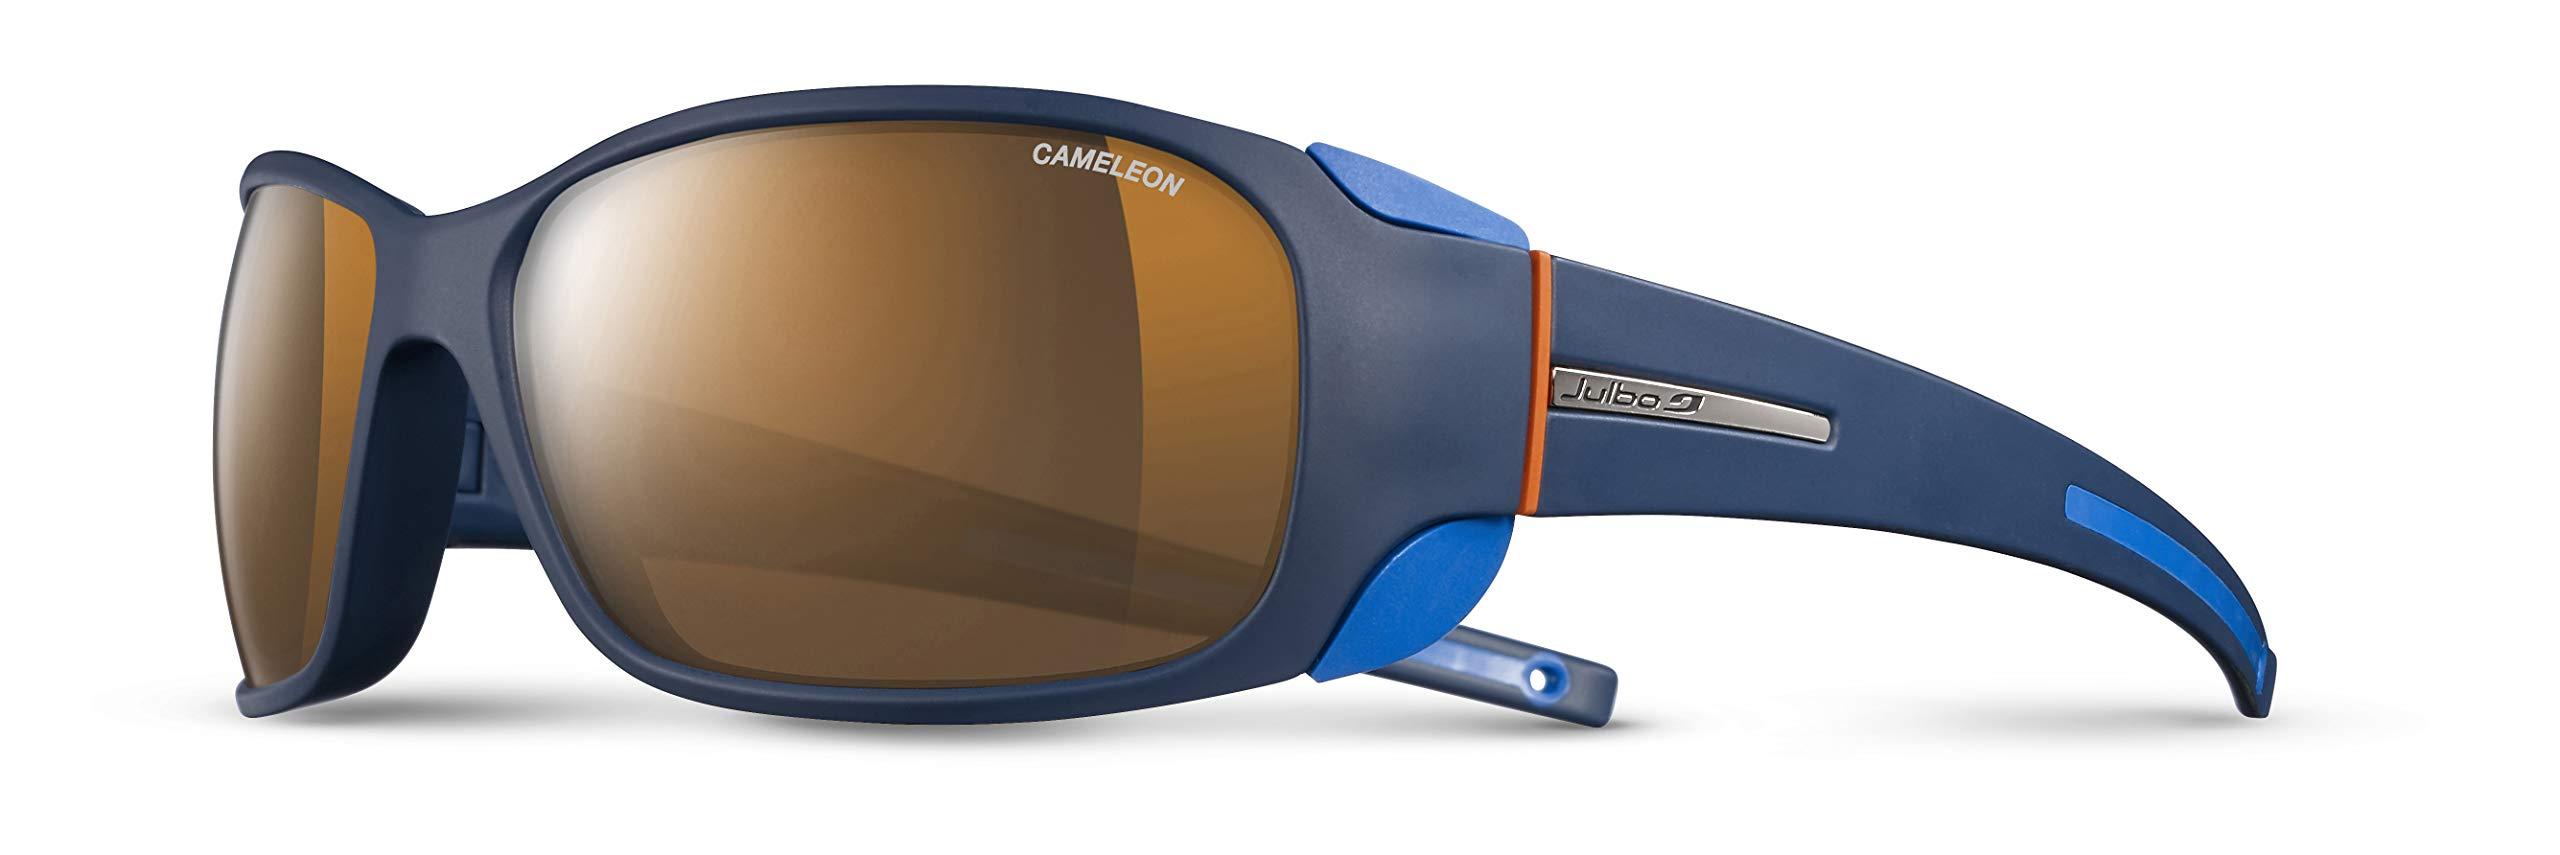 531cf45621c Julbo MonteBianco Sunglasses